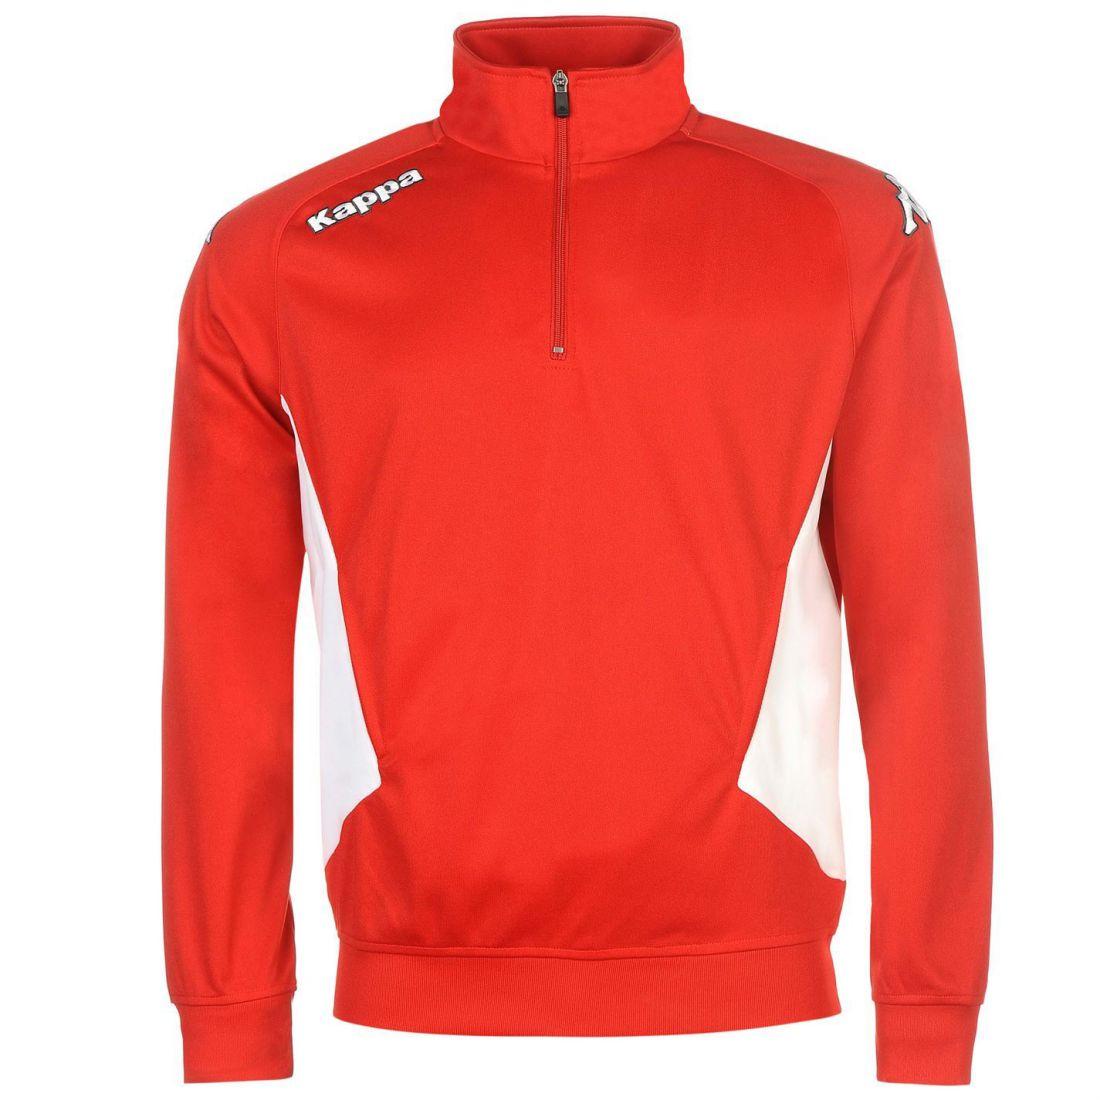 Details about Kappa Mens Foligno Sweater Jumper Pullover Football High Neck  Print Quarter Zip 36d3abe7a